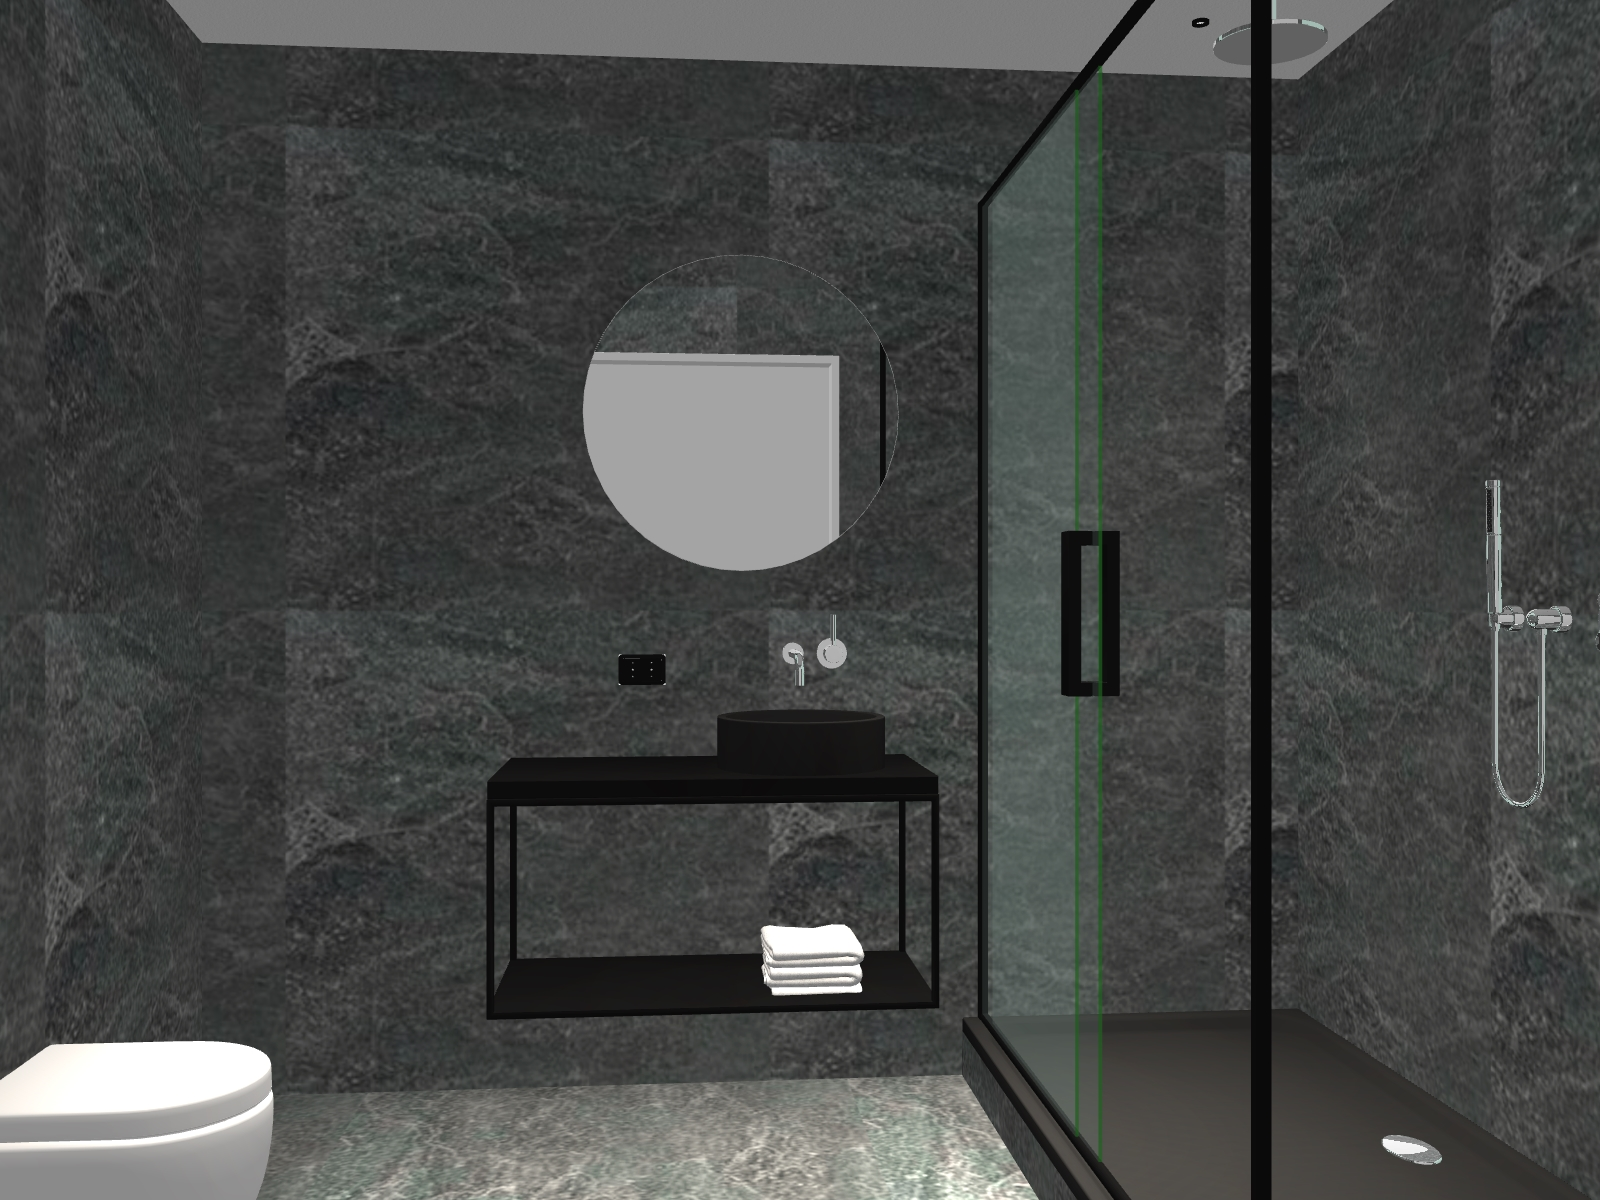 3d ontwerp badkamer bij Dicks badkamer in Haarlem